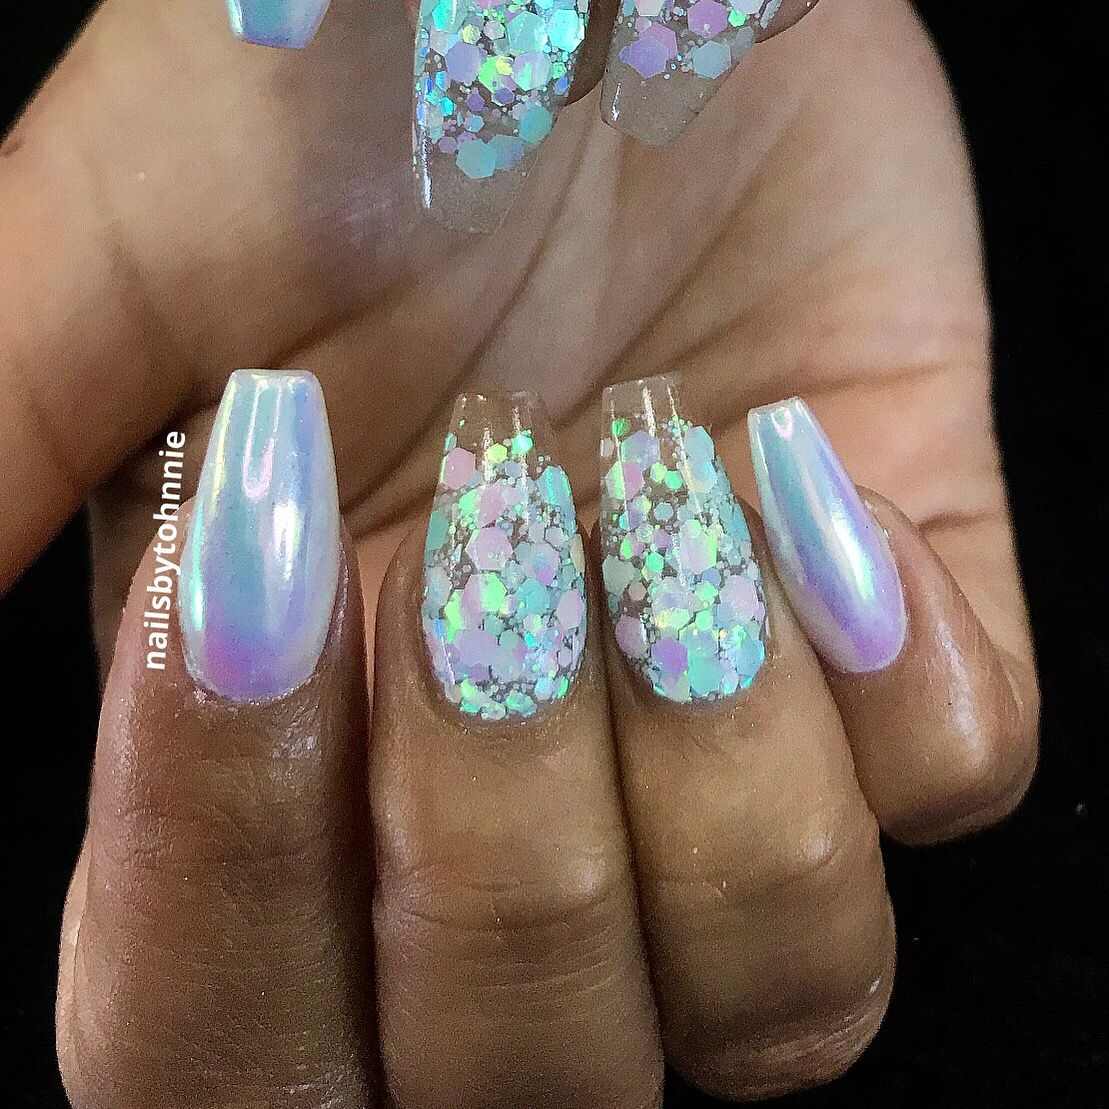 Pin by esmeralda gamboa on nails in pinterest nails nail